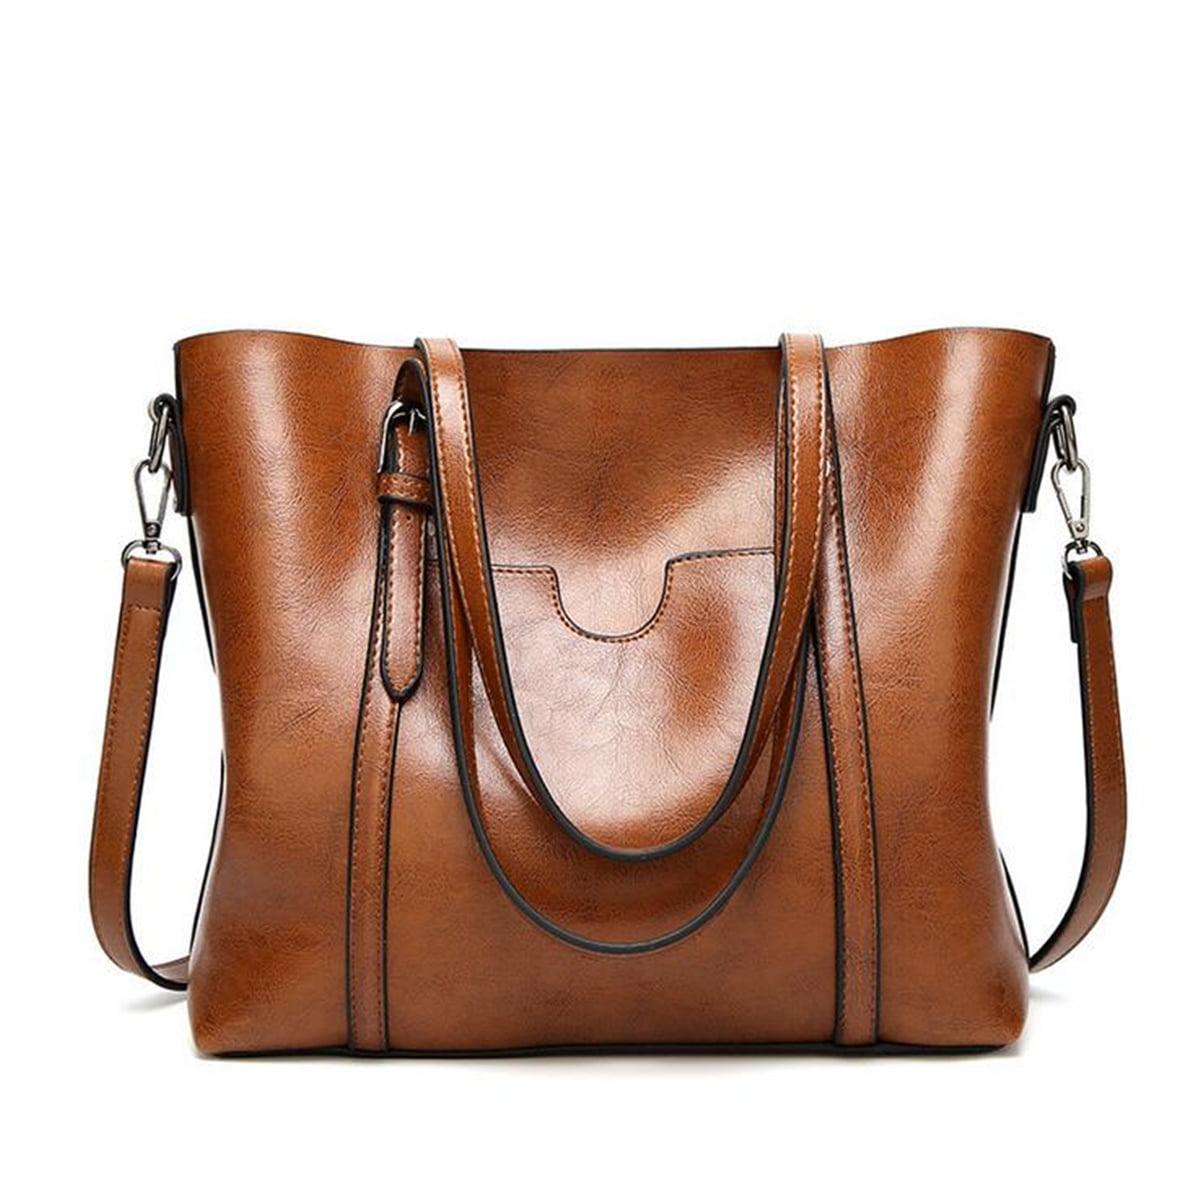 Details about  /Fashion Women Lady Chain Shoulder Bags PU Leather Messenger Party Clutch Handbag